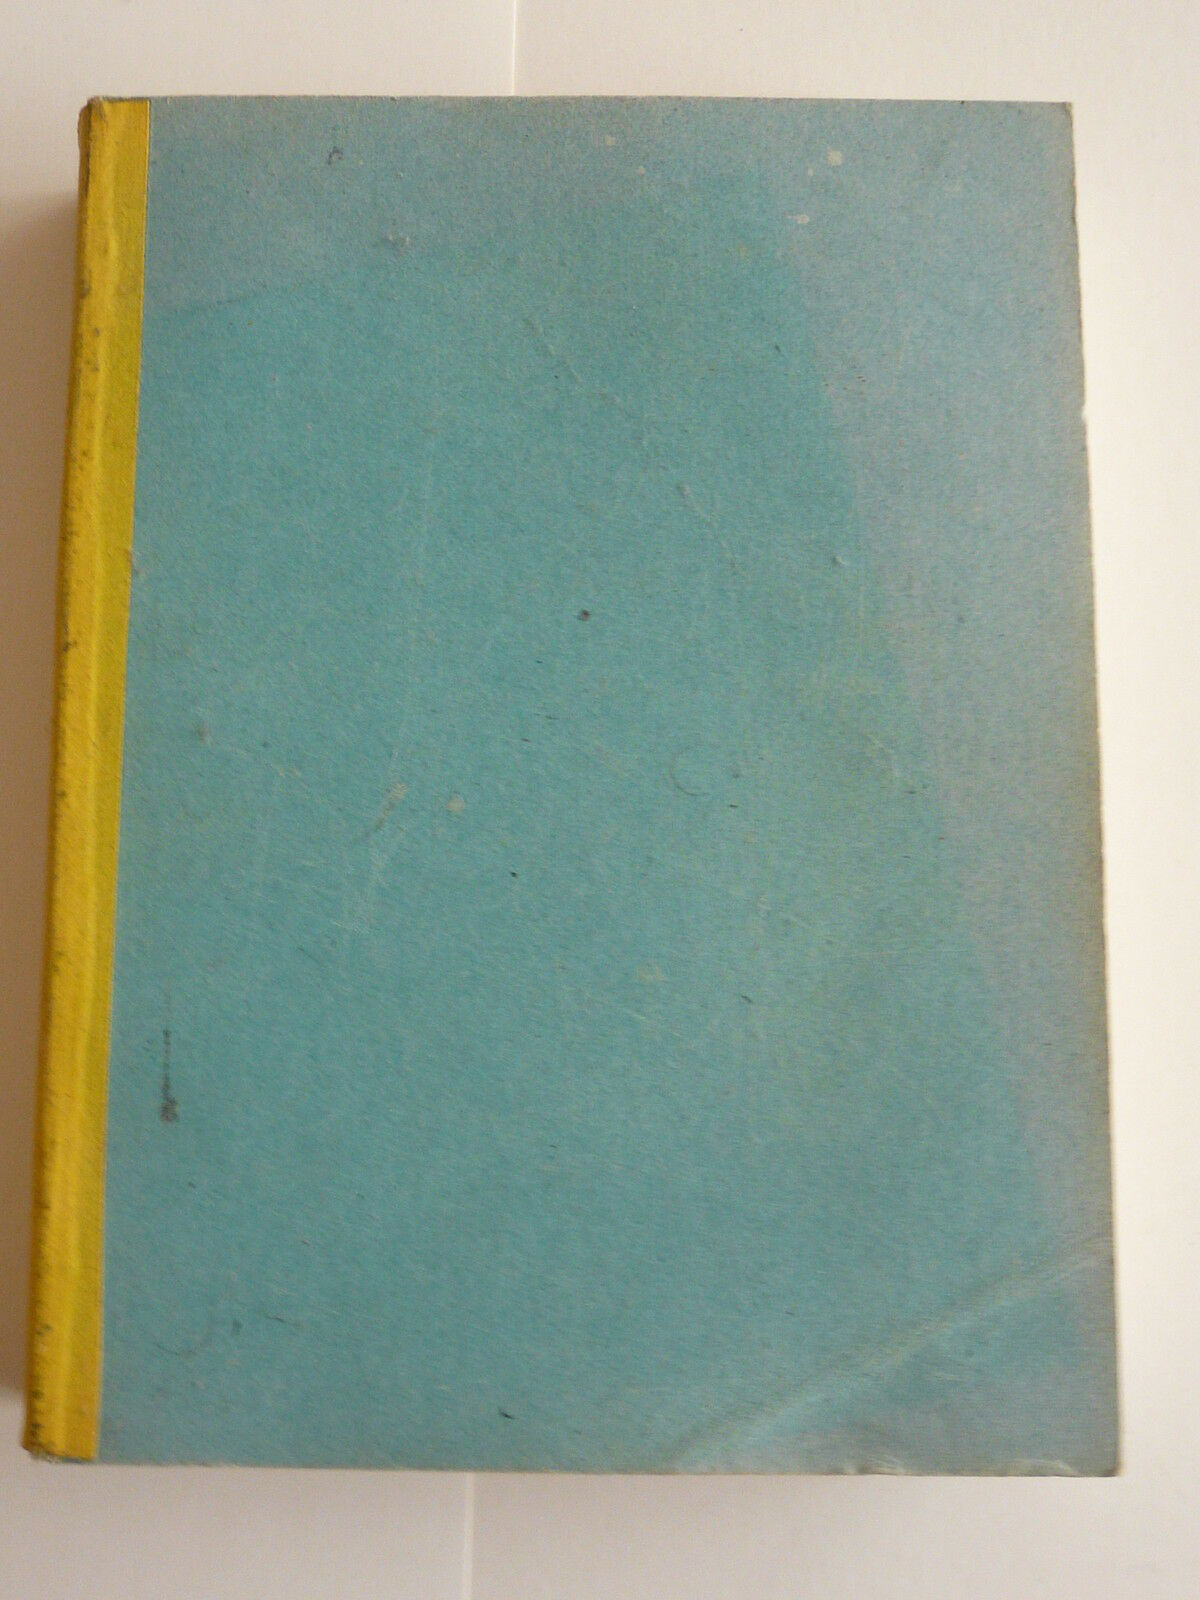 LOCO REVUE  RELIE - 1976 - N° 368 a 378